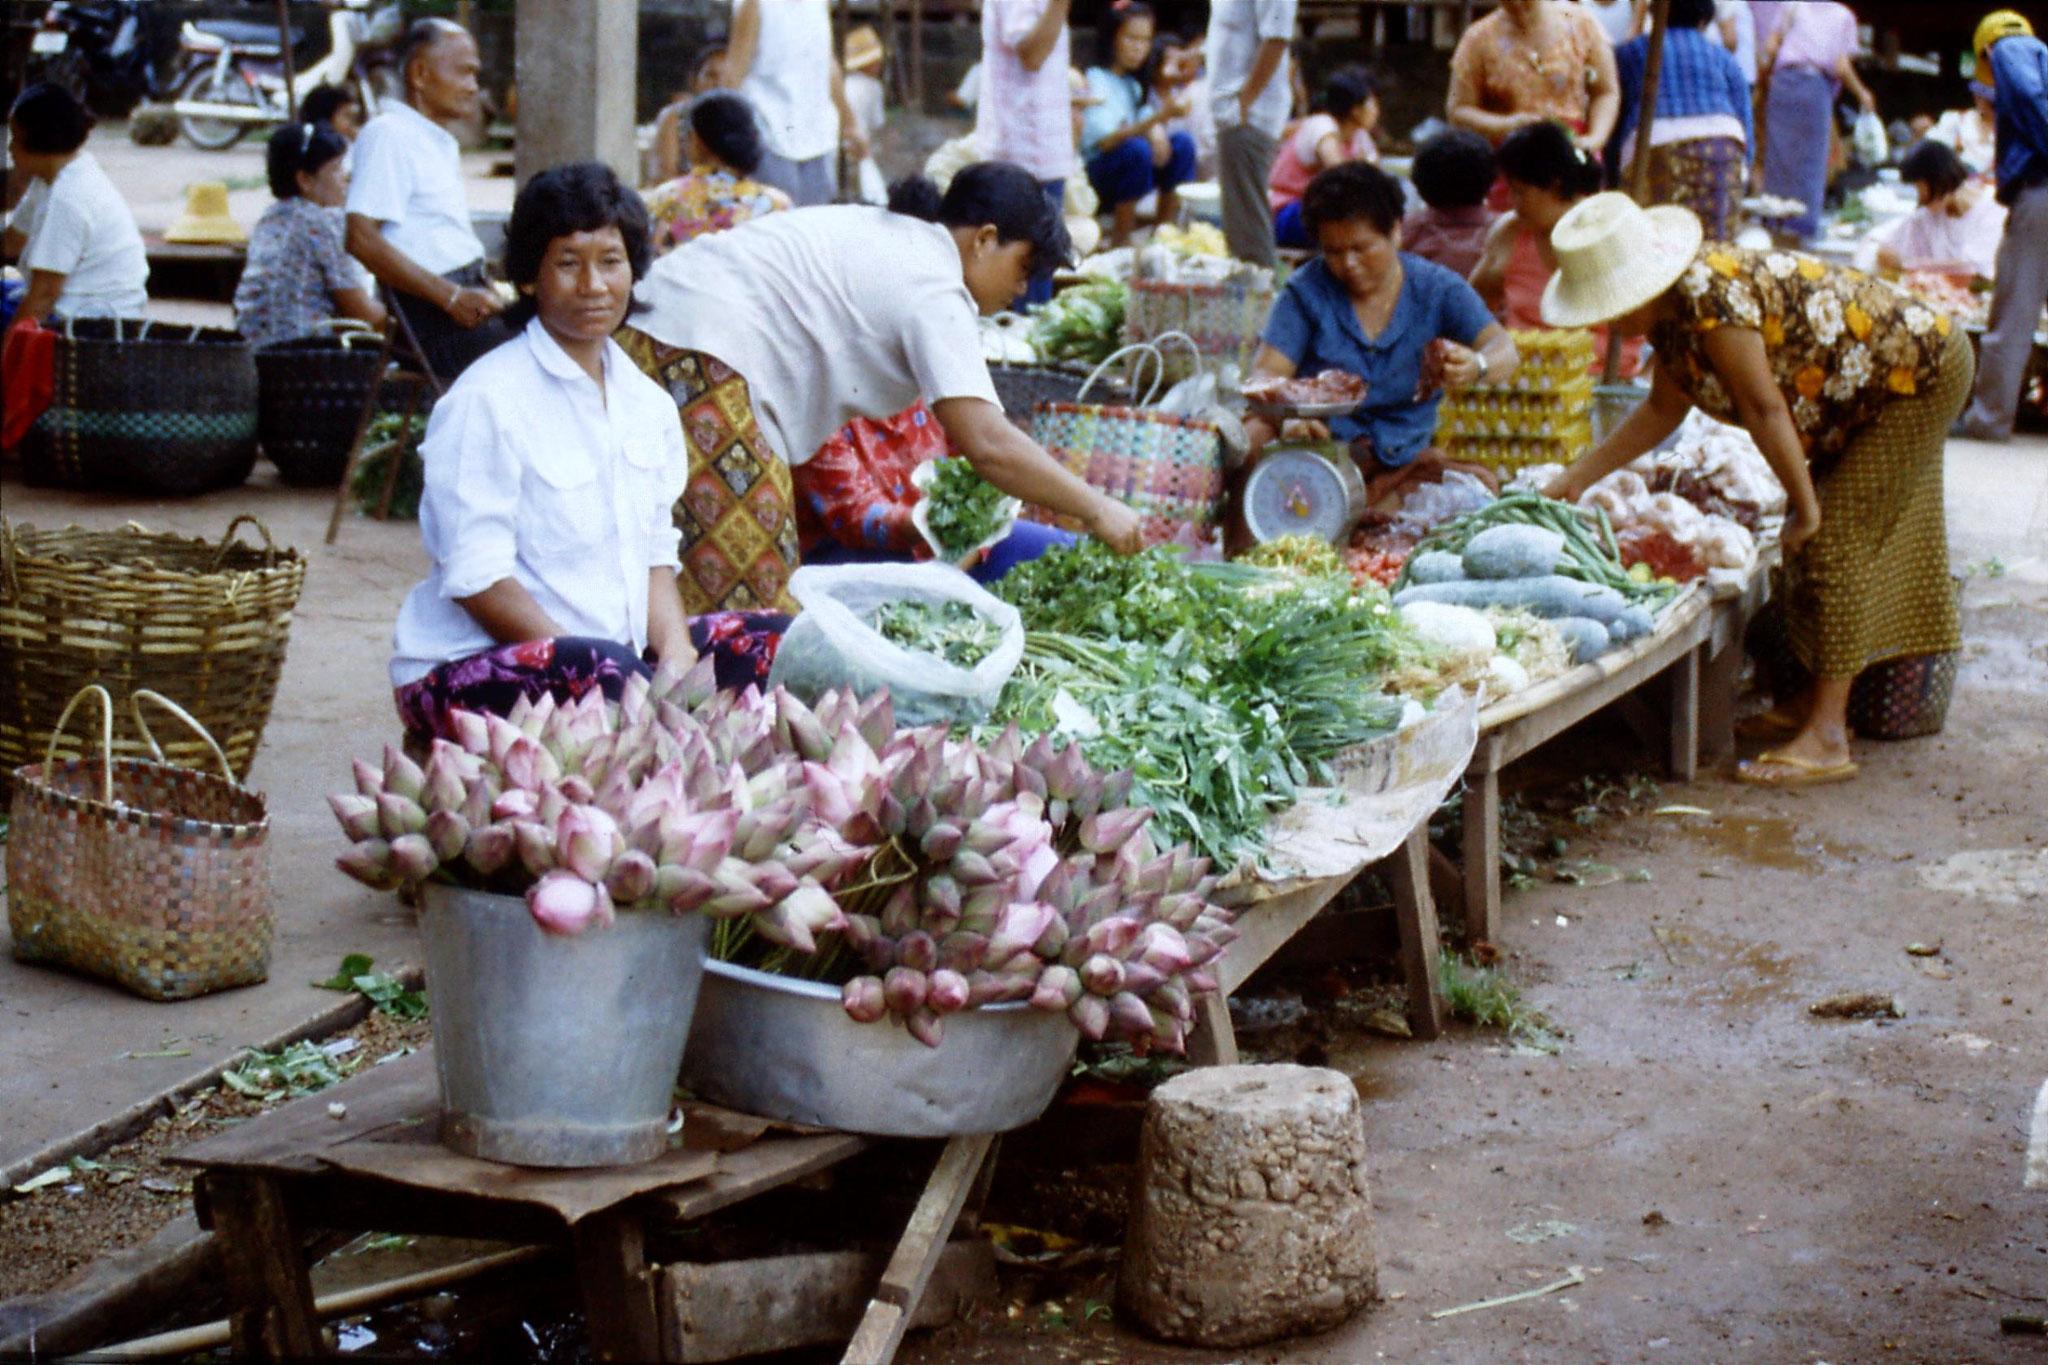 30/5/1990: 30: Nong Khai market